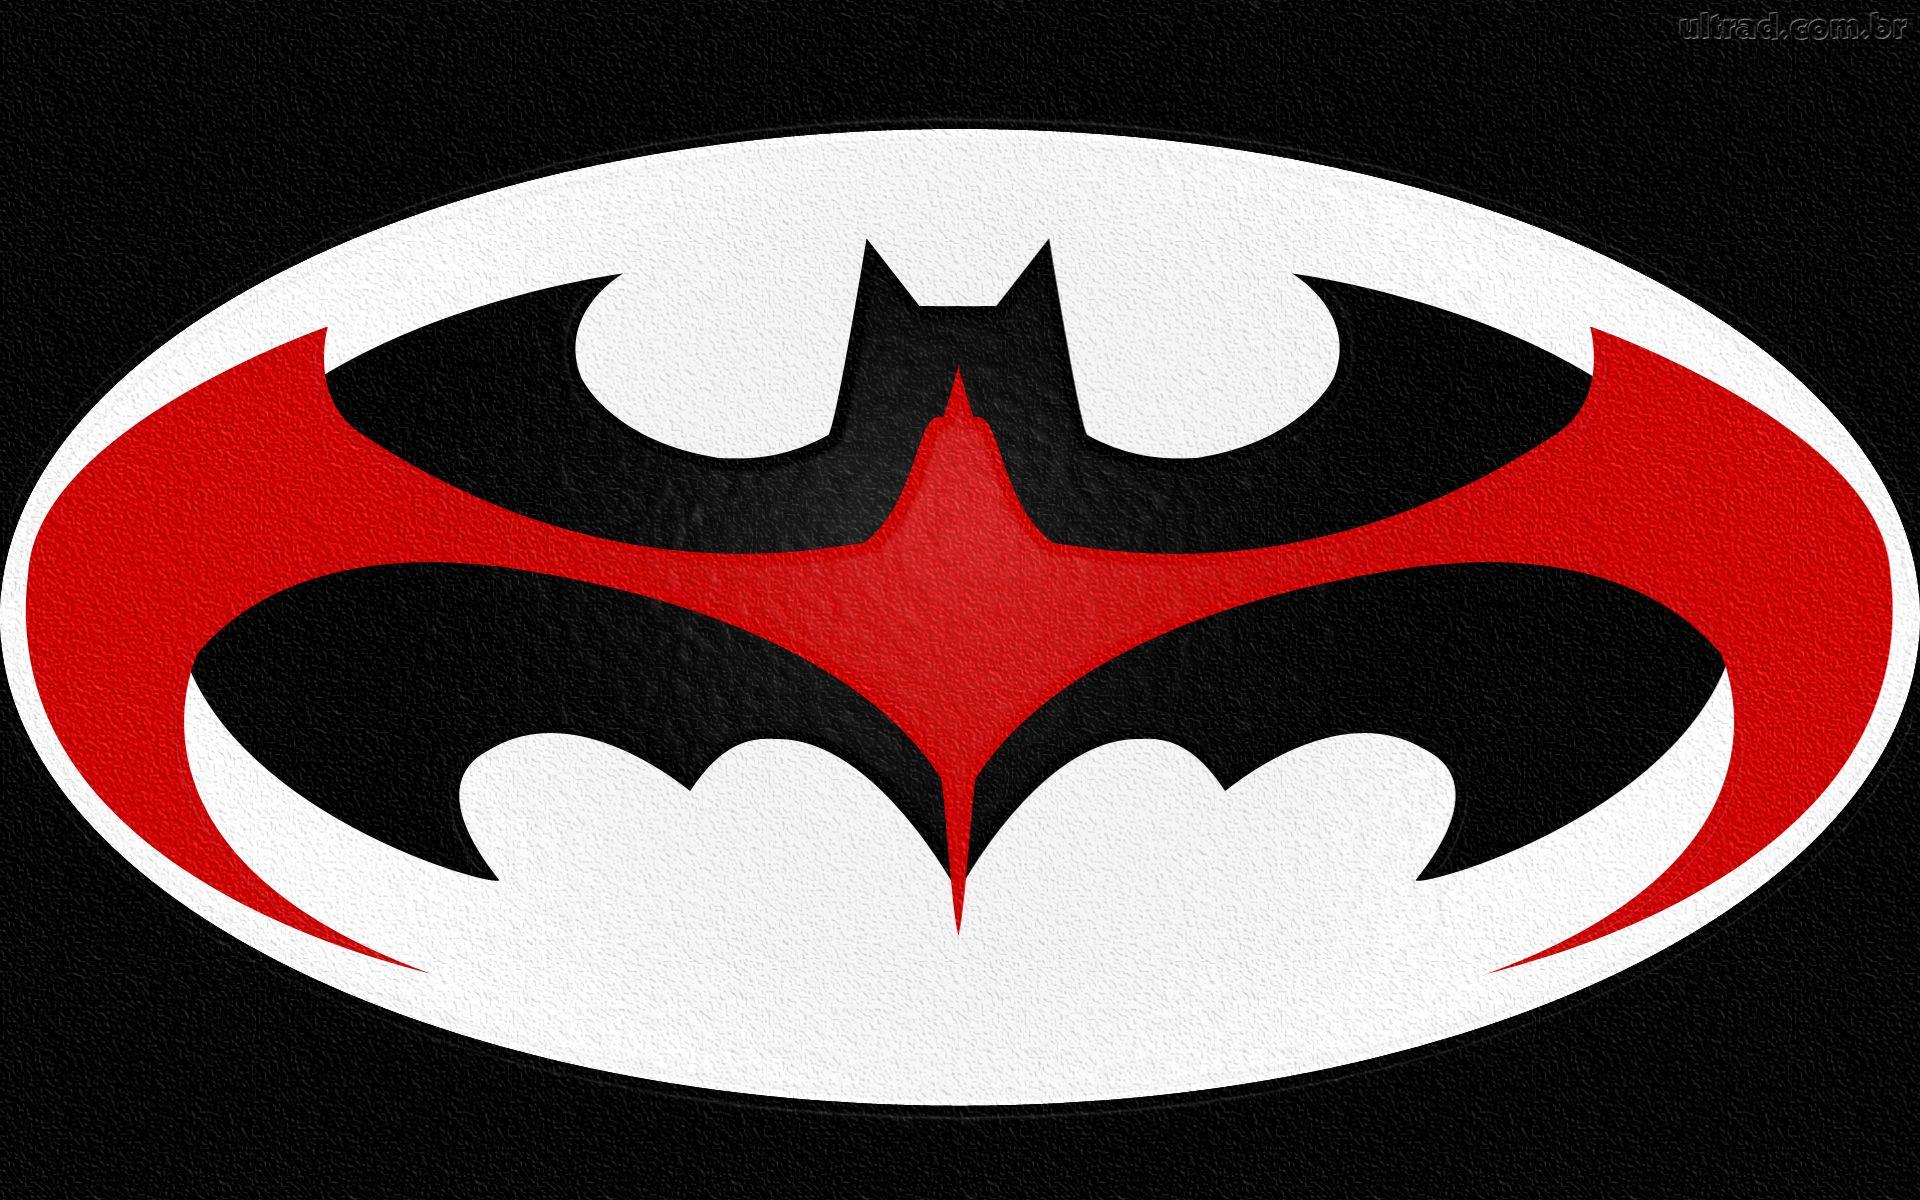 Free Escudo De Batman, Download Free Clip Art, Free Clip ... - photo#43